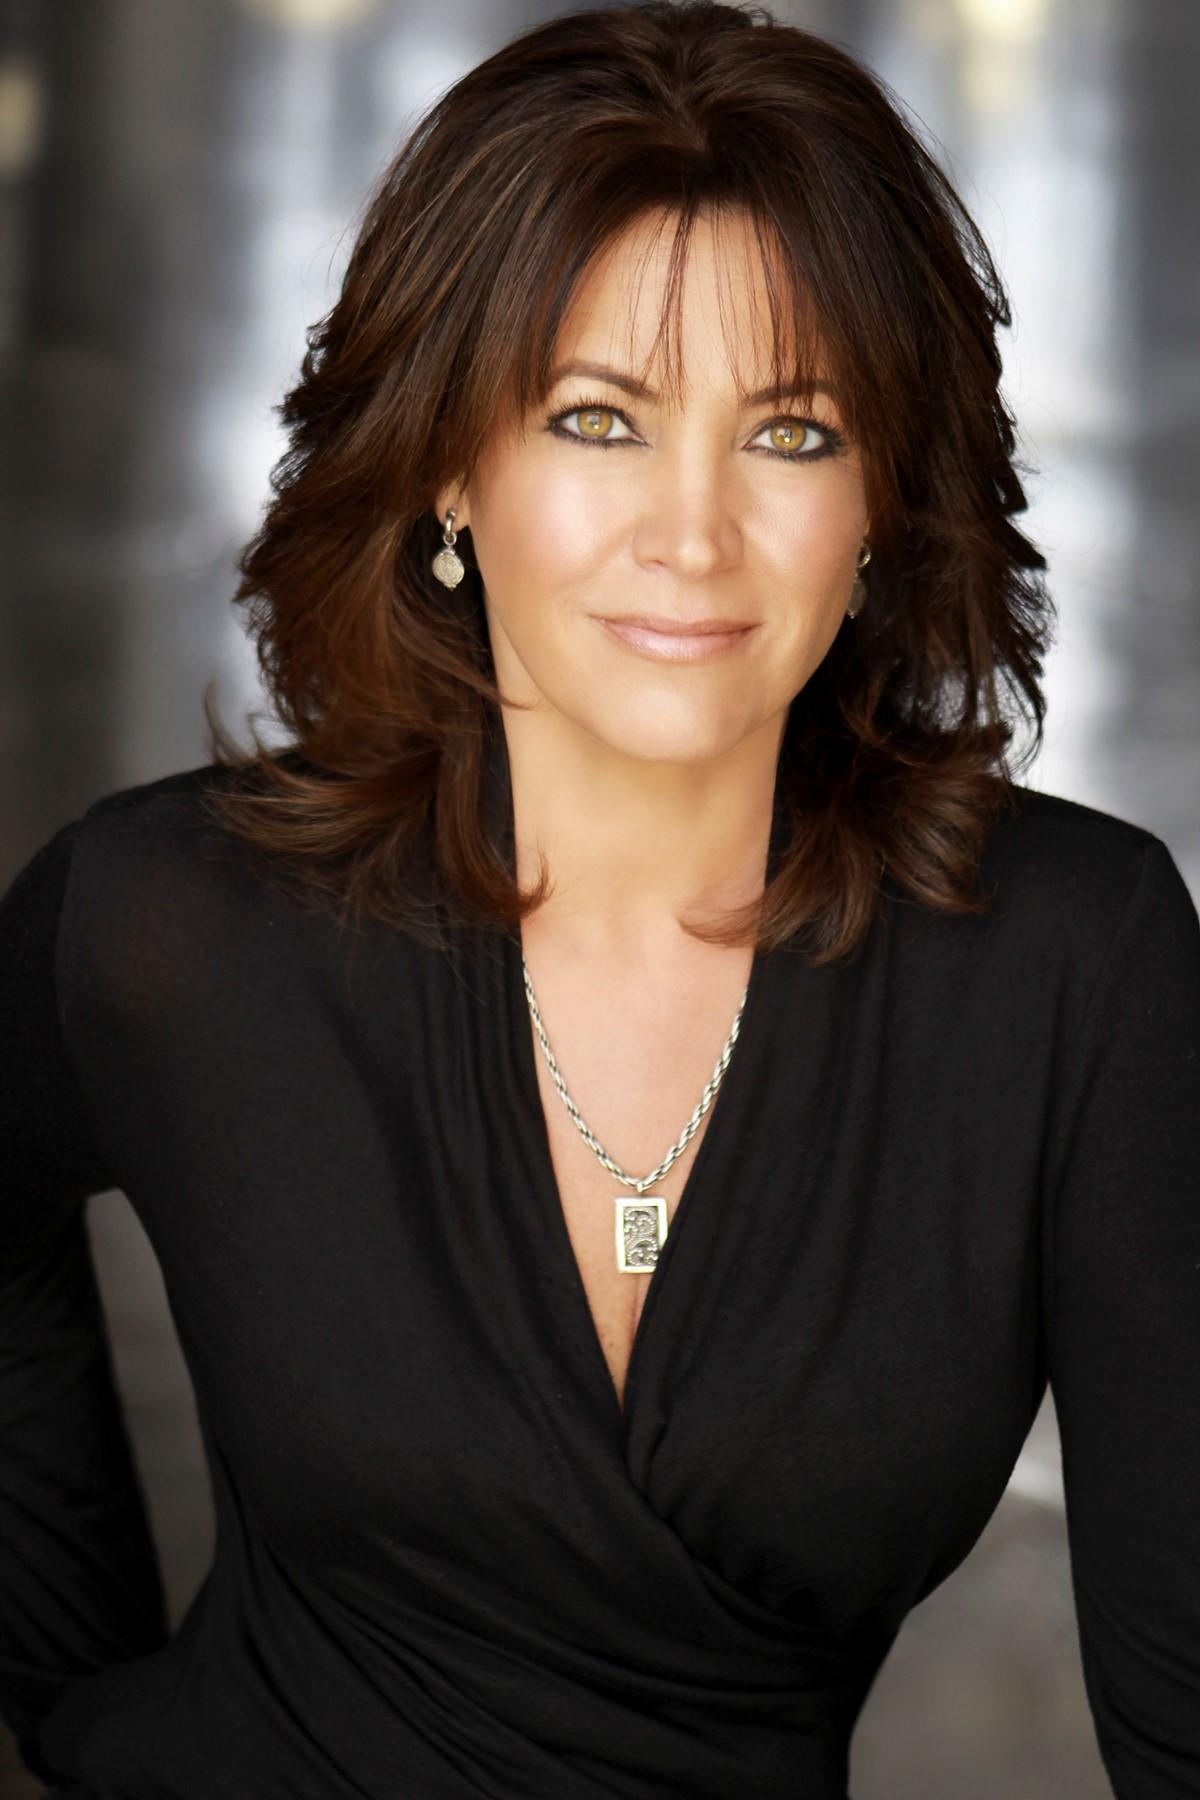 Elaine Mallon